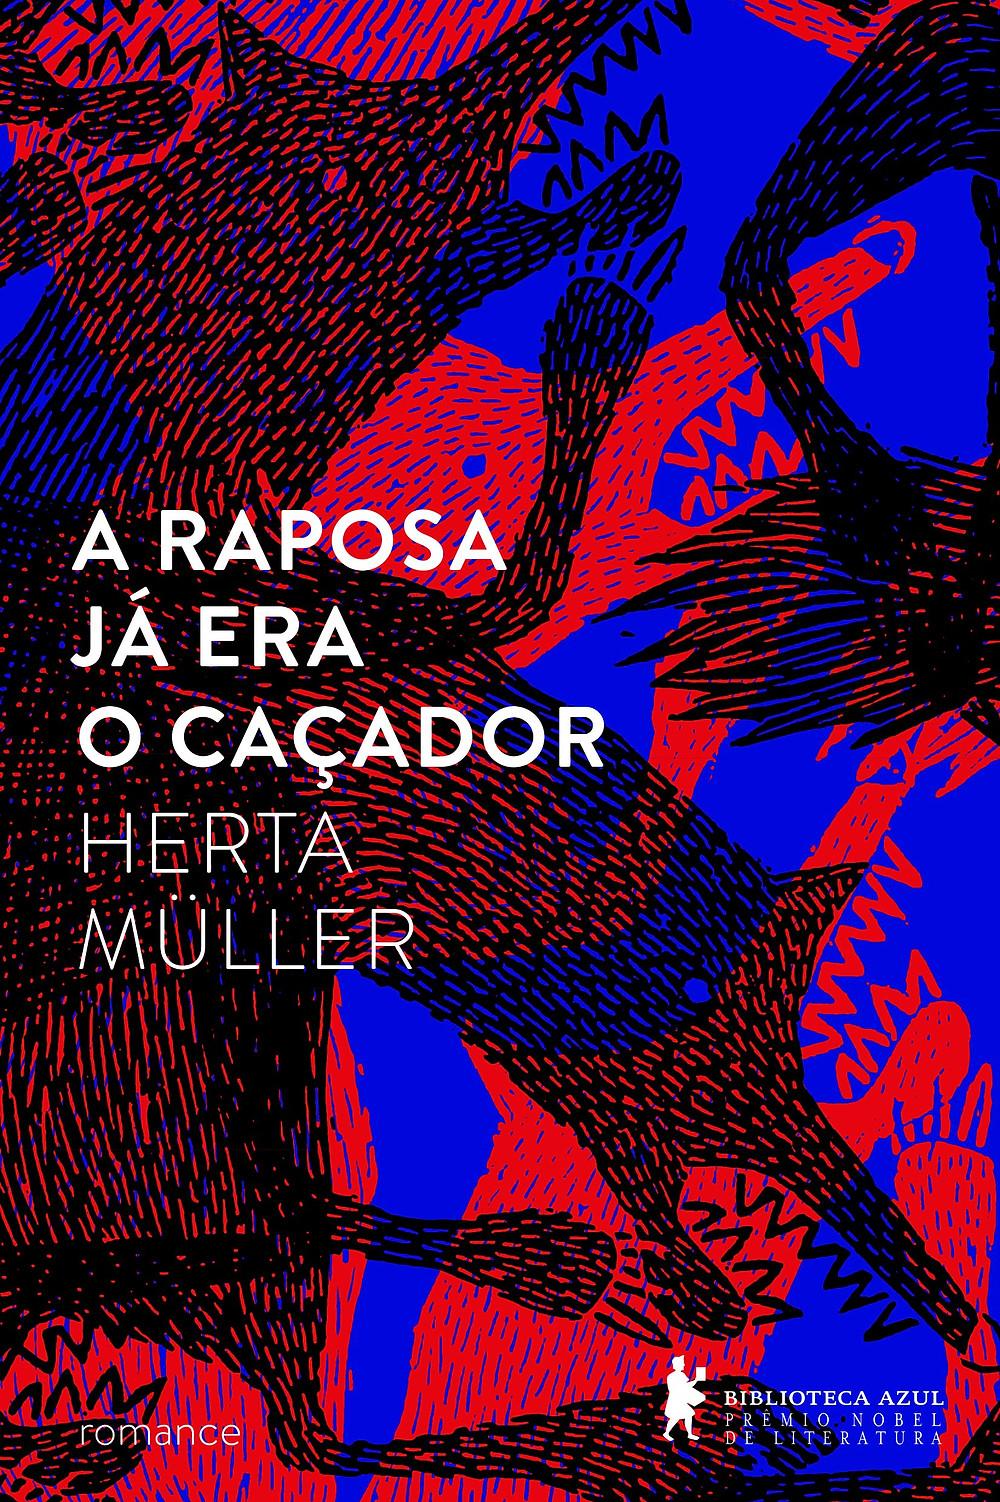 A Raposa já era o Caçador de Herta Müller